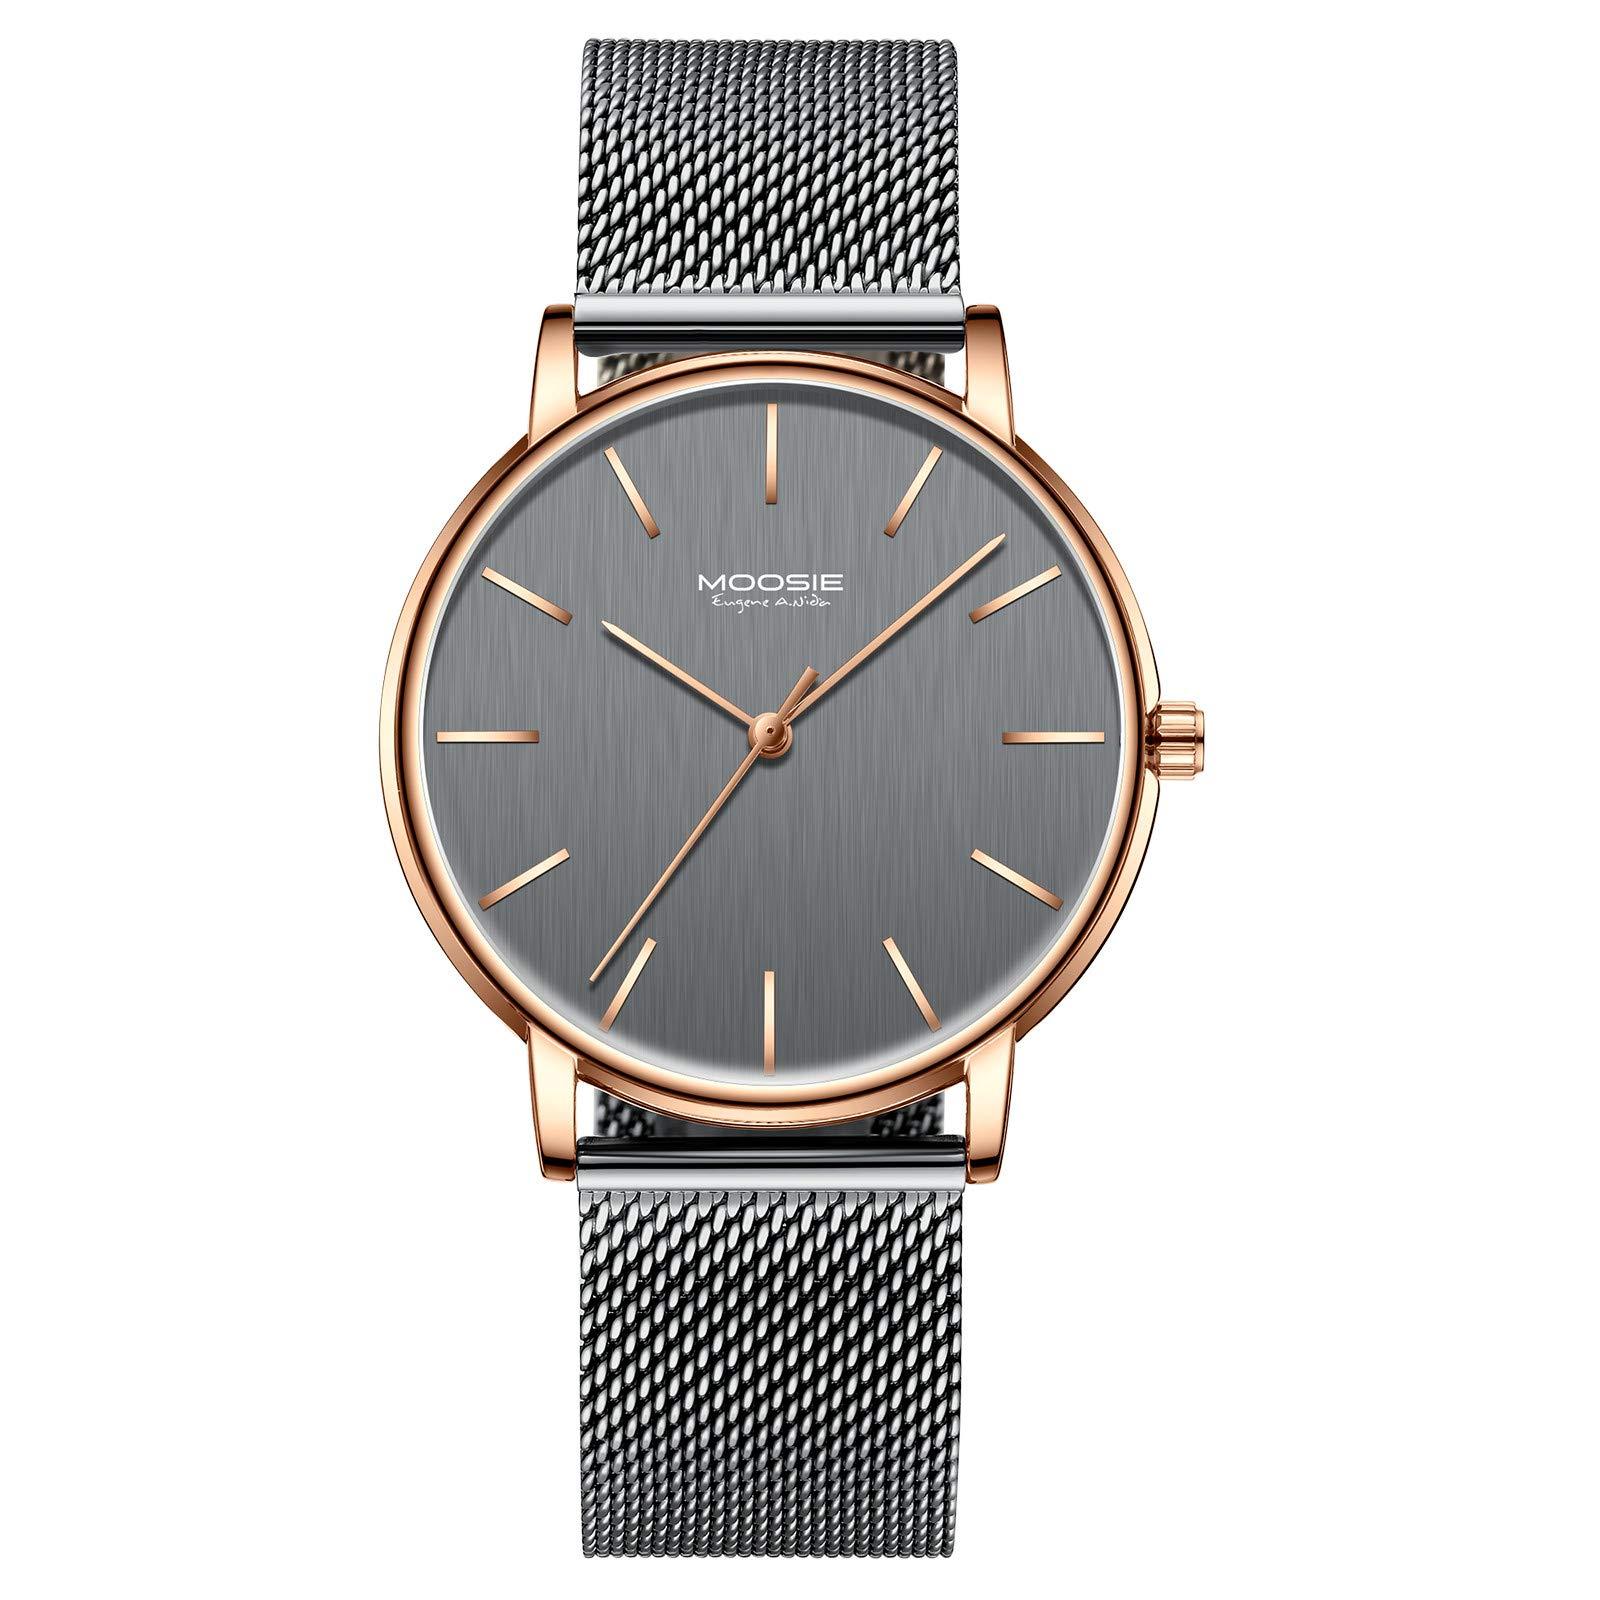 79aa3df19a 腕時計、メンズ腕時計 シンプル ビジネス ファッション 超薄型 軽量 ダークブルー グレー ローズゴールド 防水 腕時計 アナログ クォーツ時計  ミニマリスト